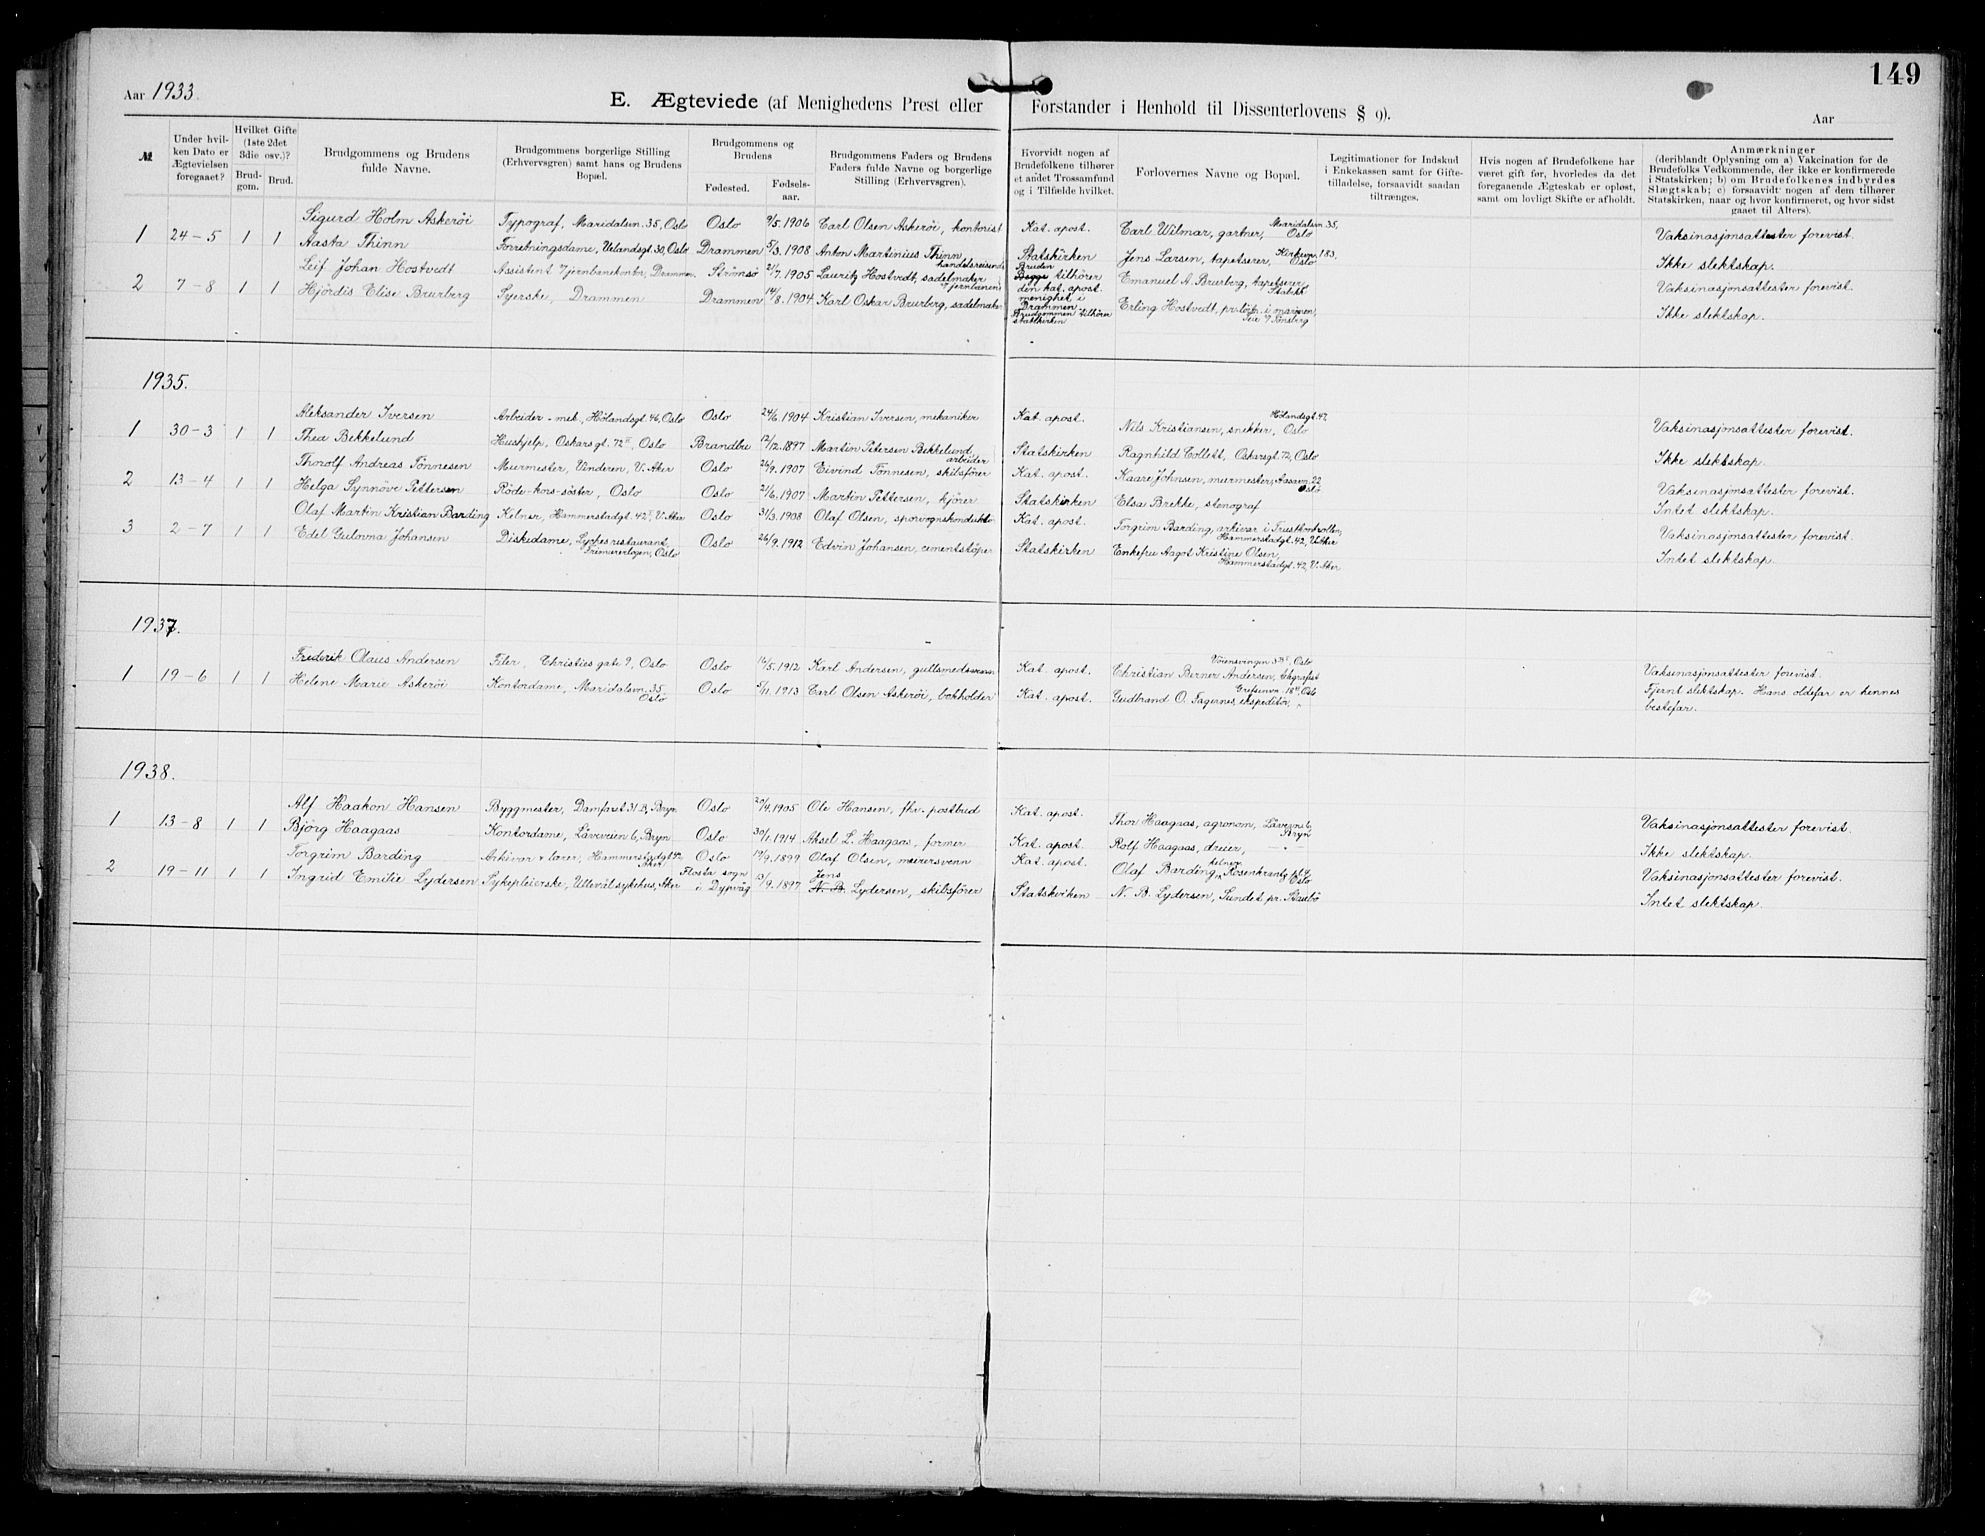 SAO, Den katolsk apostoliske menighet i Oslo , F/Fa/L0002: Dissenterprotokoll nr. 2, 1892-1937, s. 149